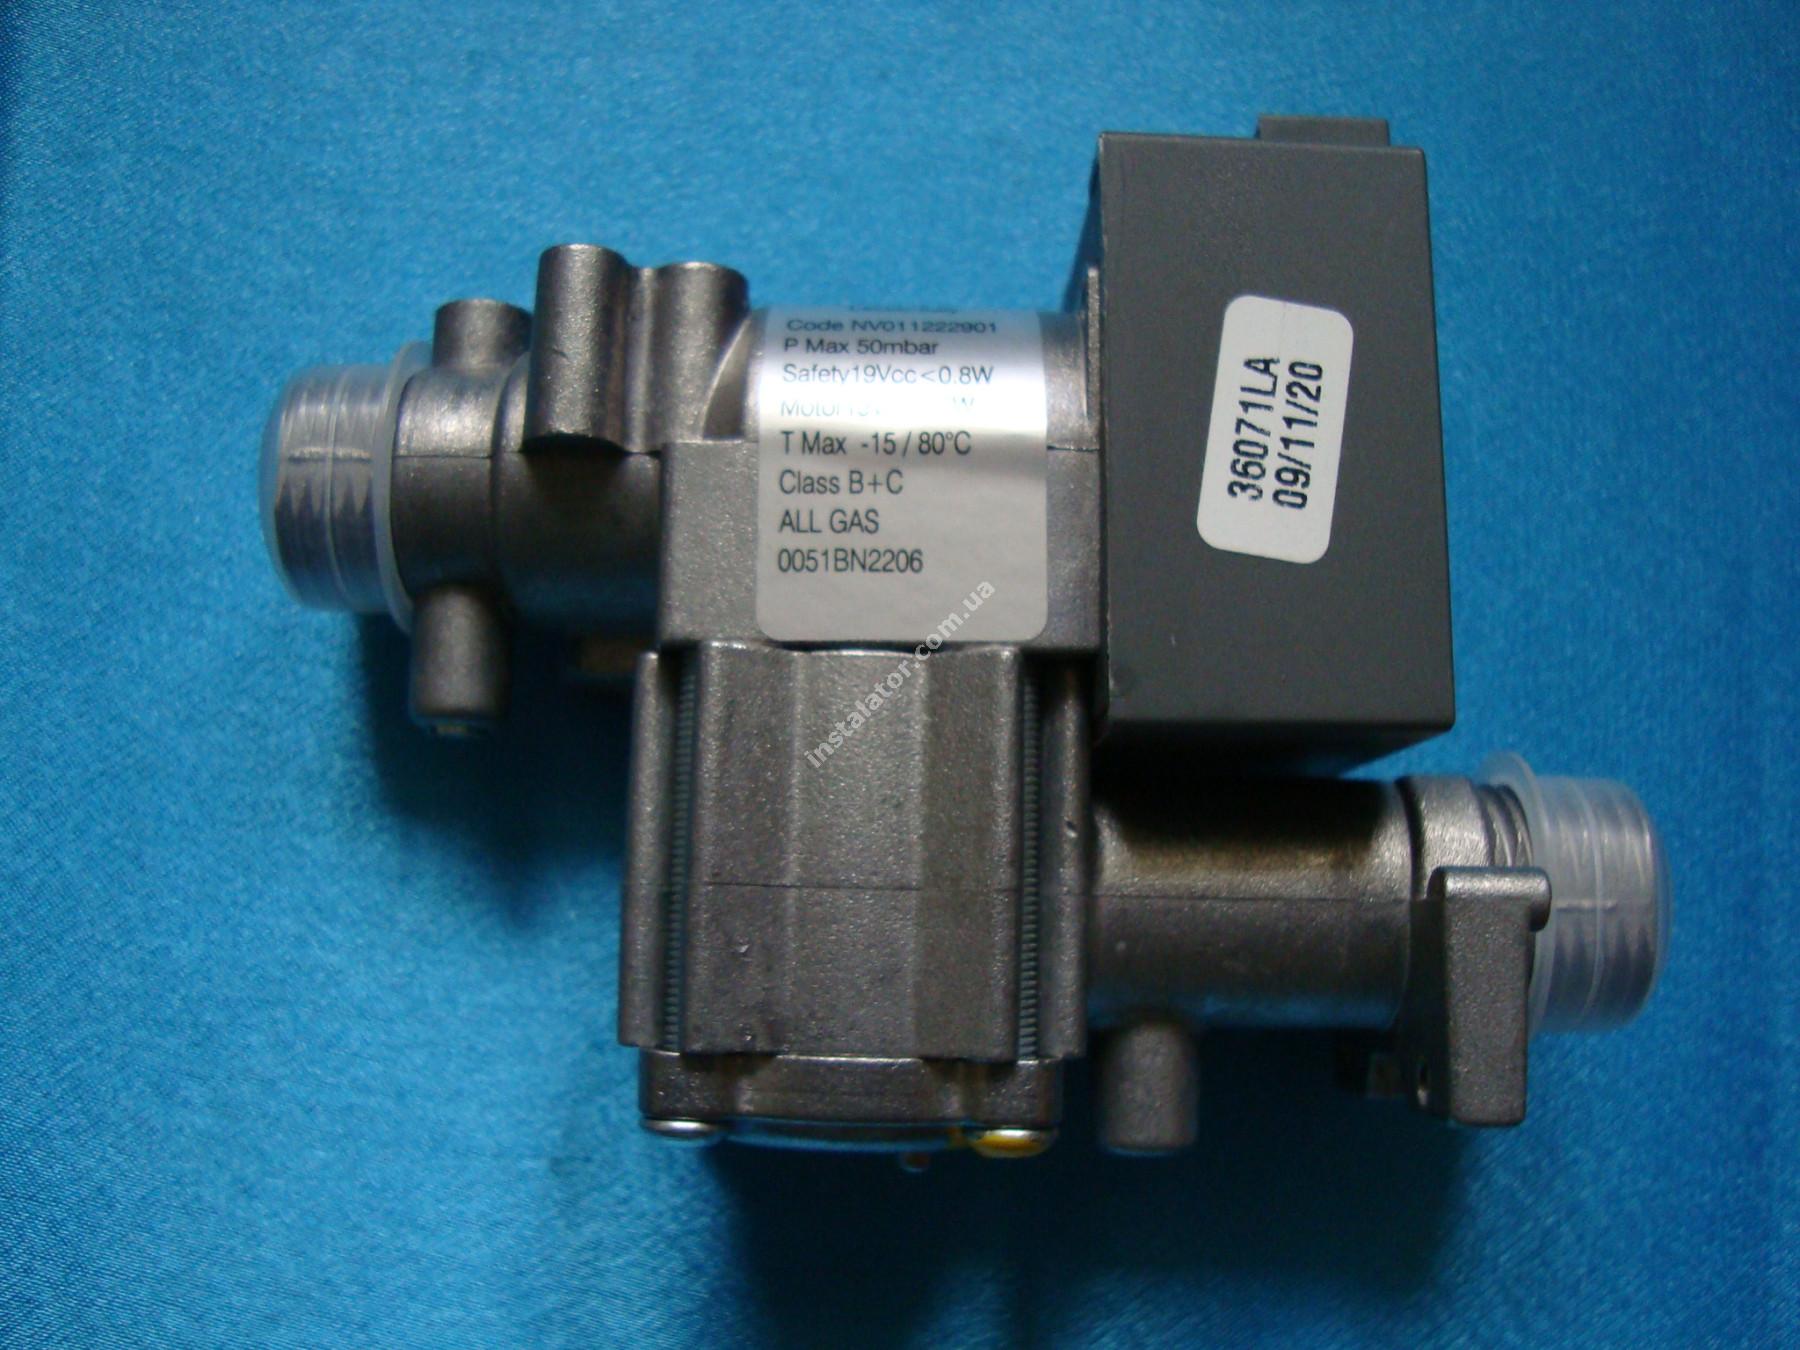 36071LA Газовий клапан Radiant M24 full-image-1